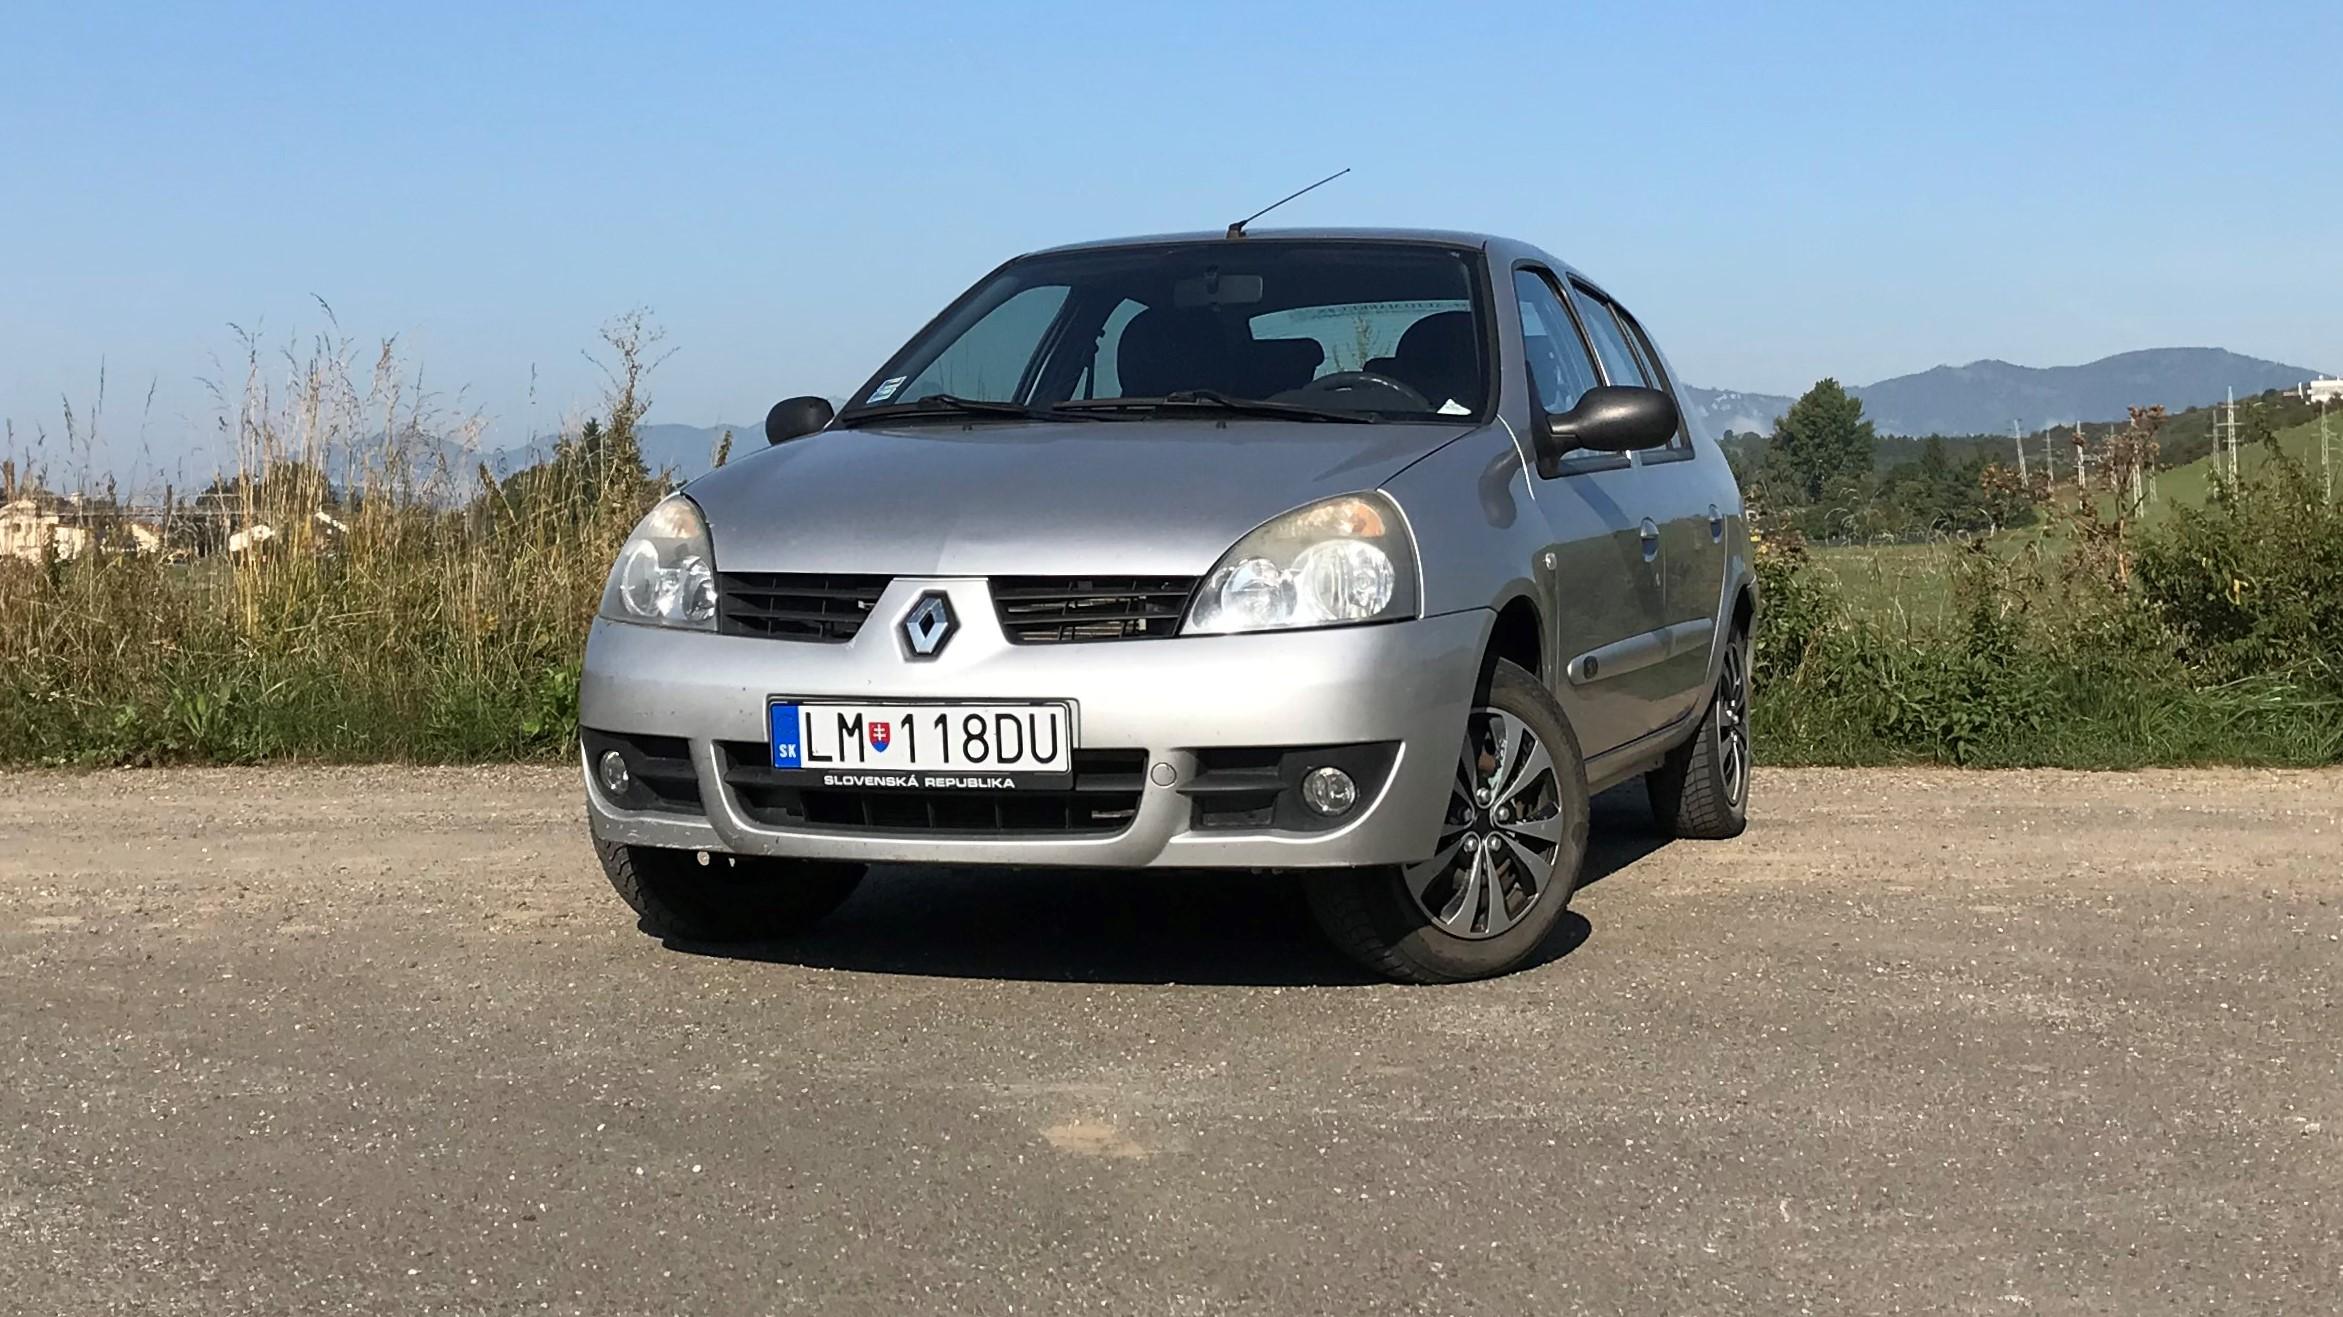 2008 Renault Thalia 1.2 recenzia skúsenosti test